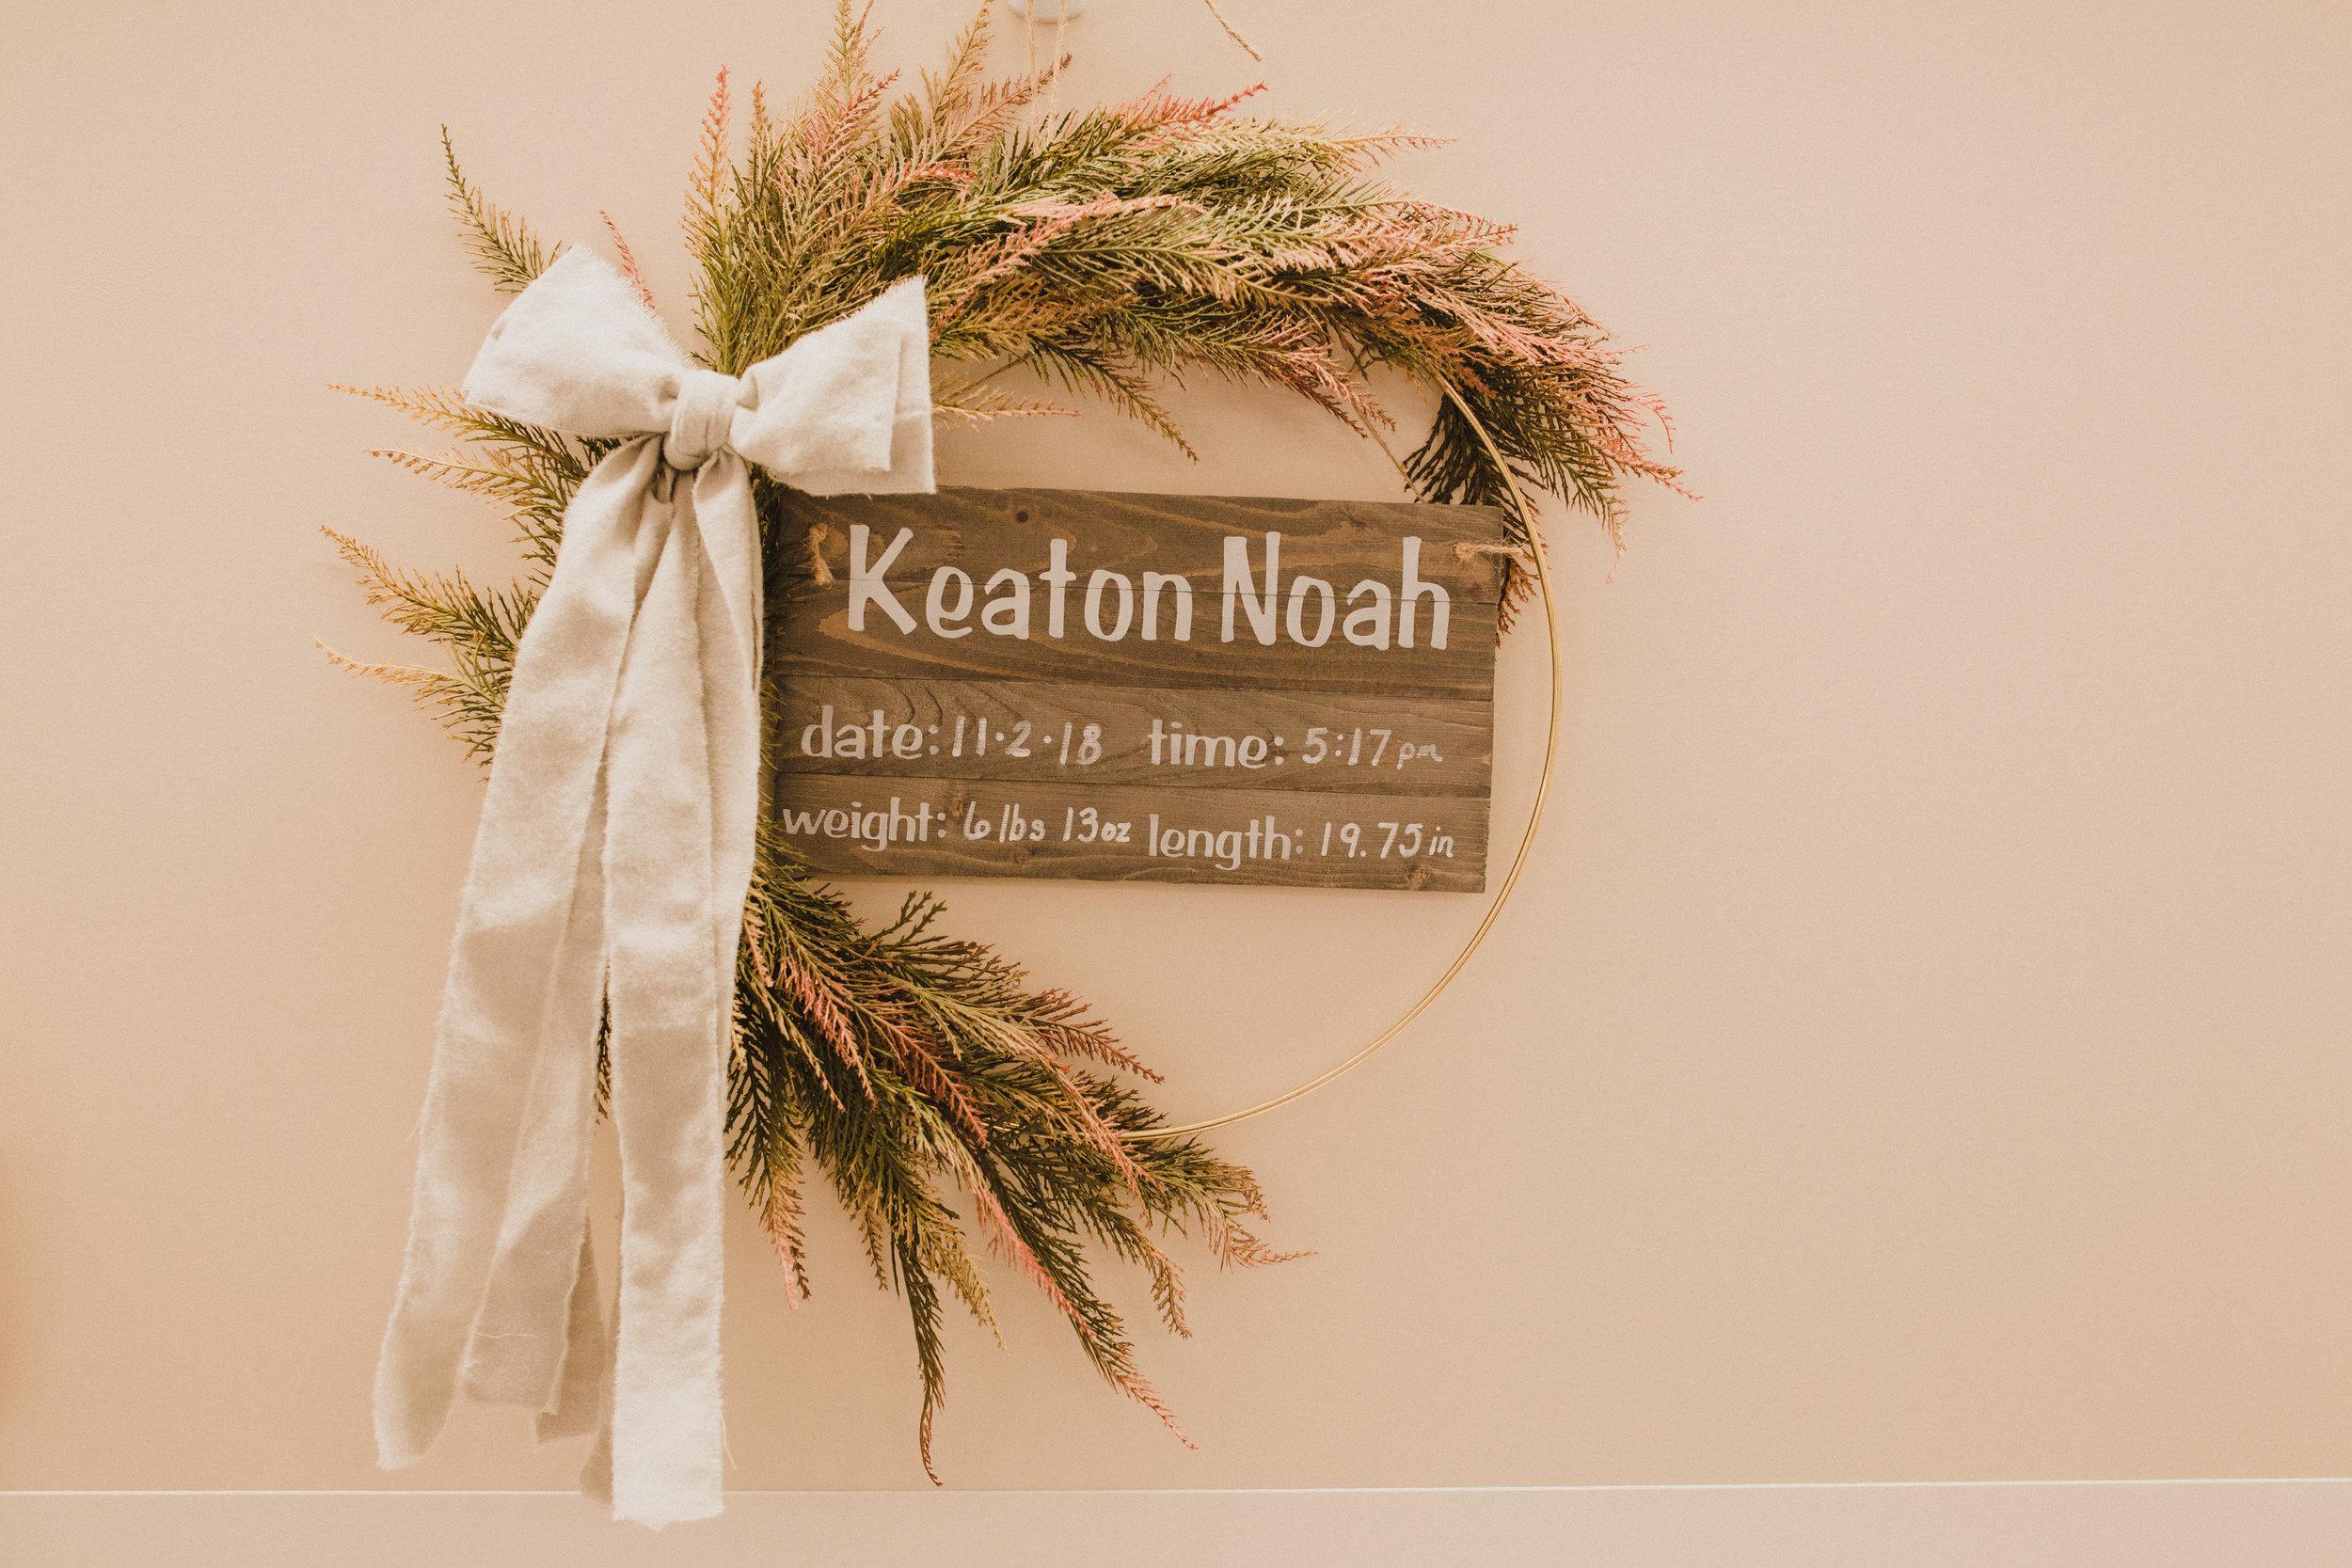 18_11_04 Alison Peterson Fresh48 - Keaton Noah53.jpg